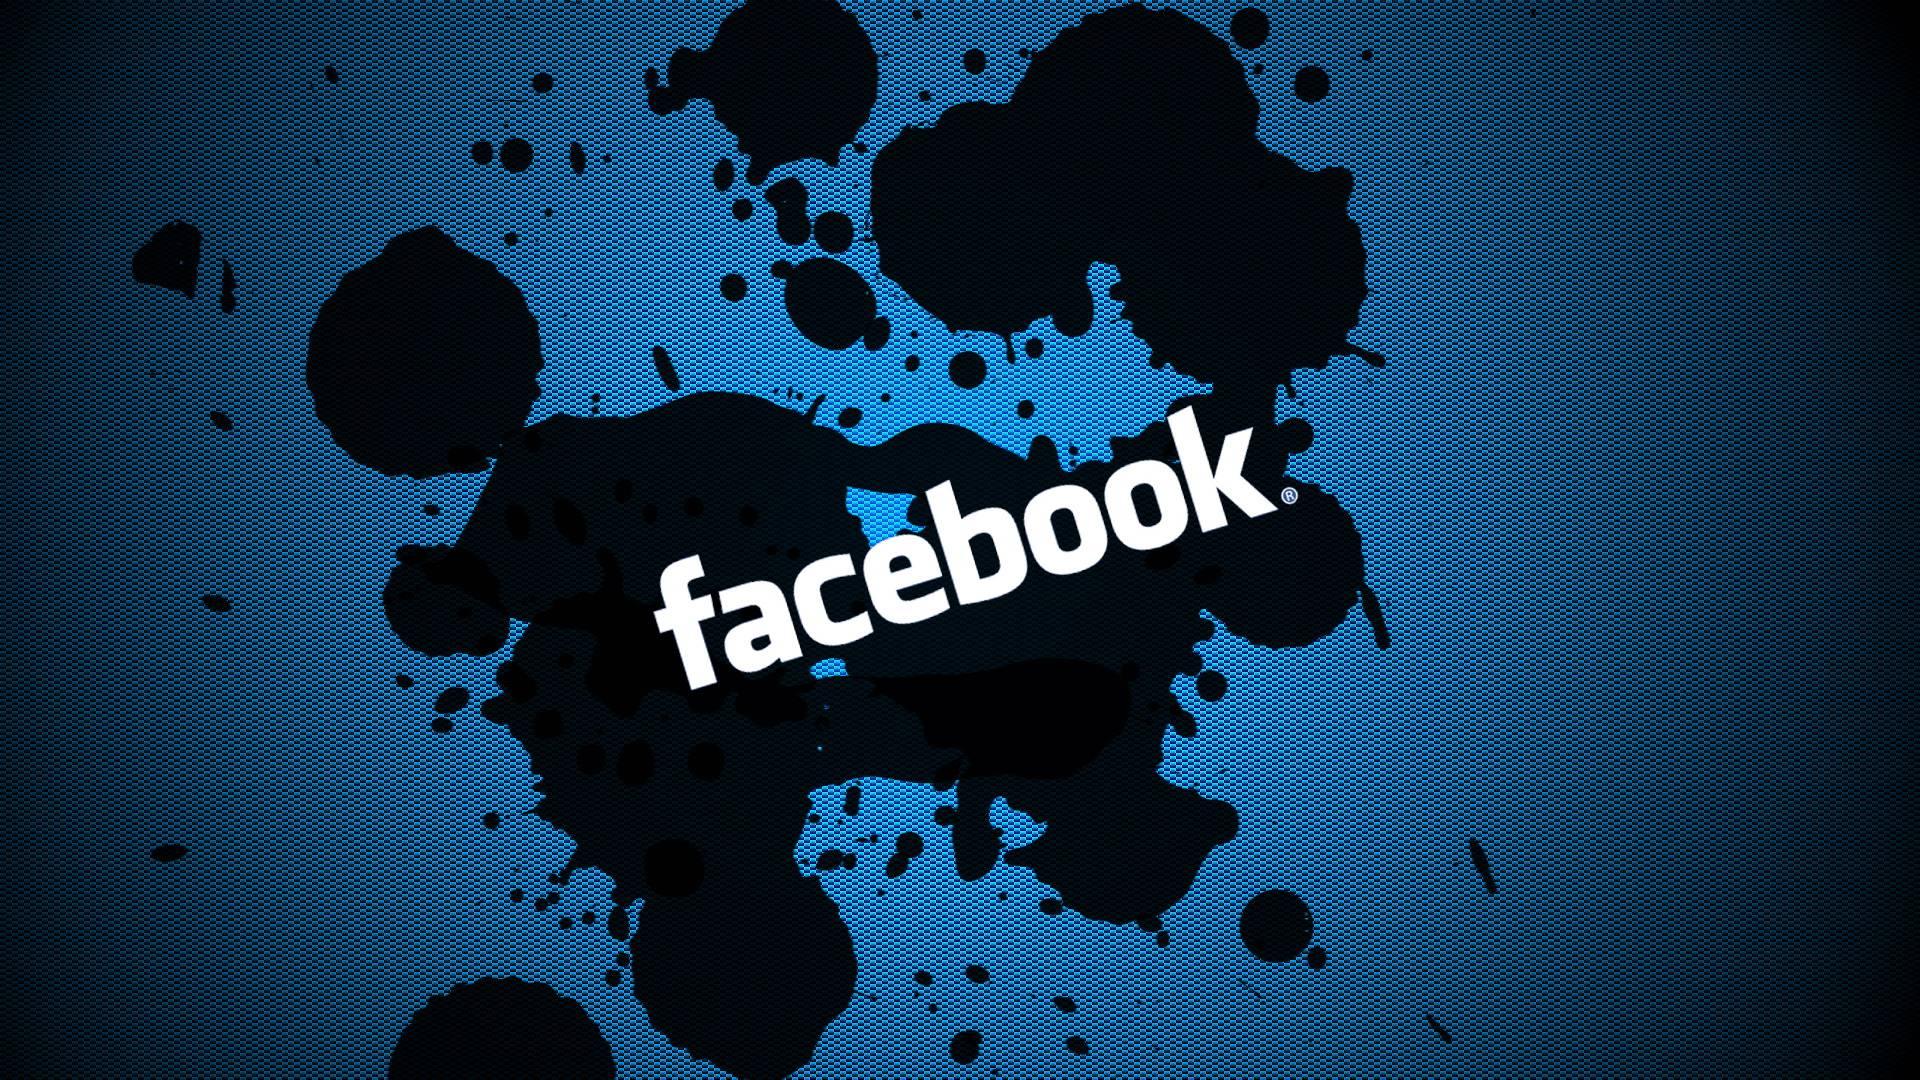 Kali Linux Se Facebook Account Hack Kaise Kare